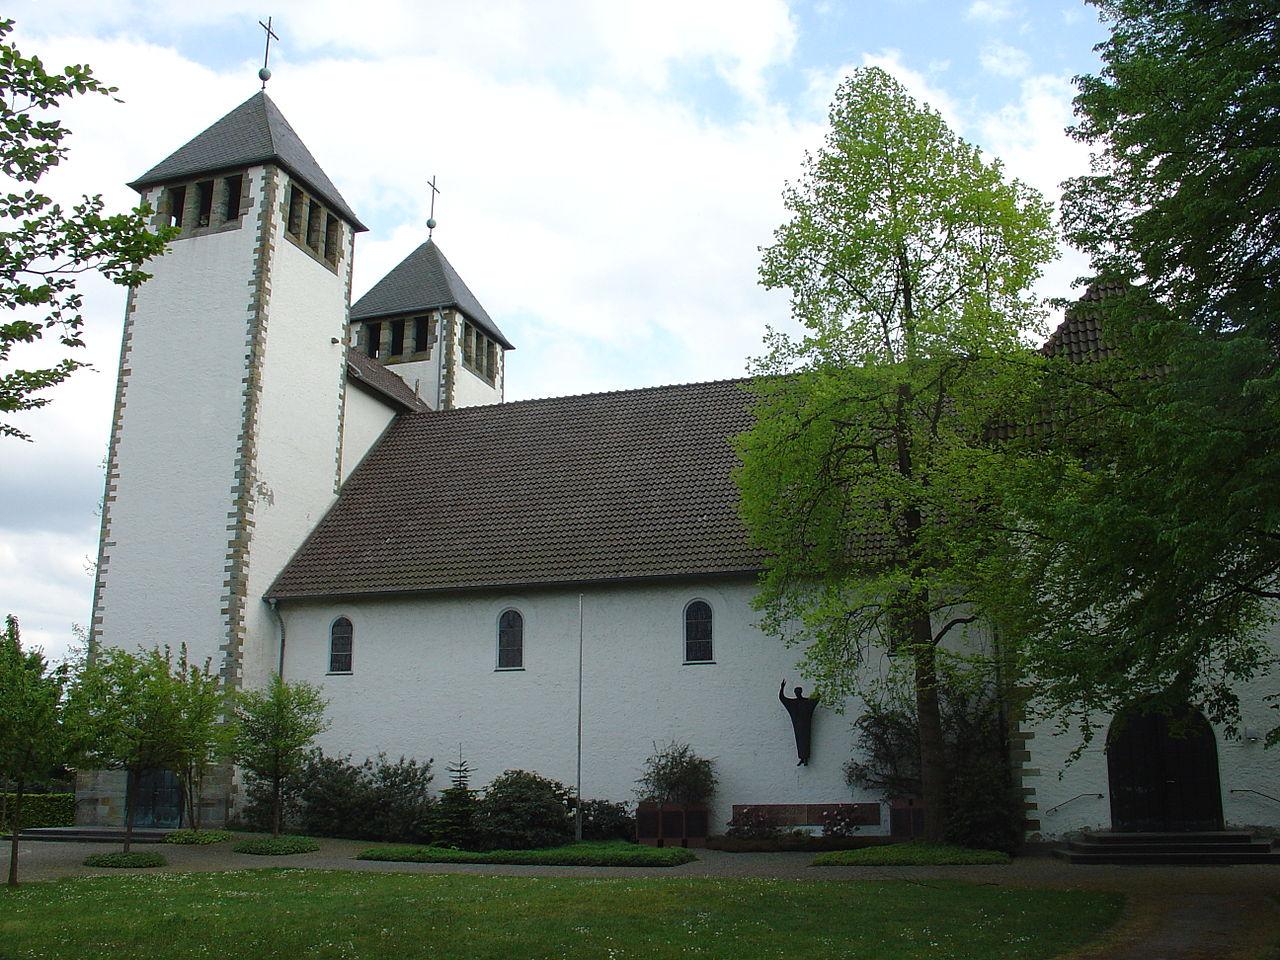 Bild Benediktinerinnen Abtei Varensell Rietberg